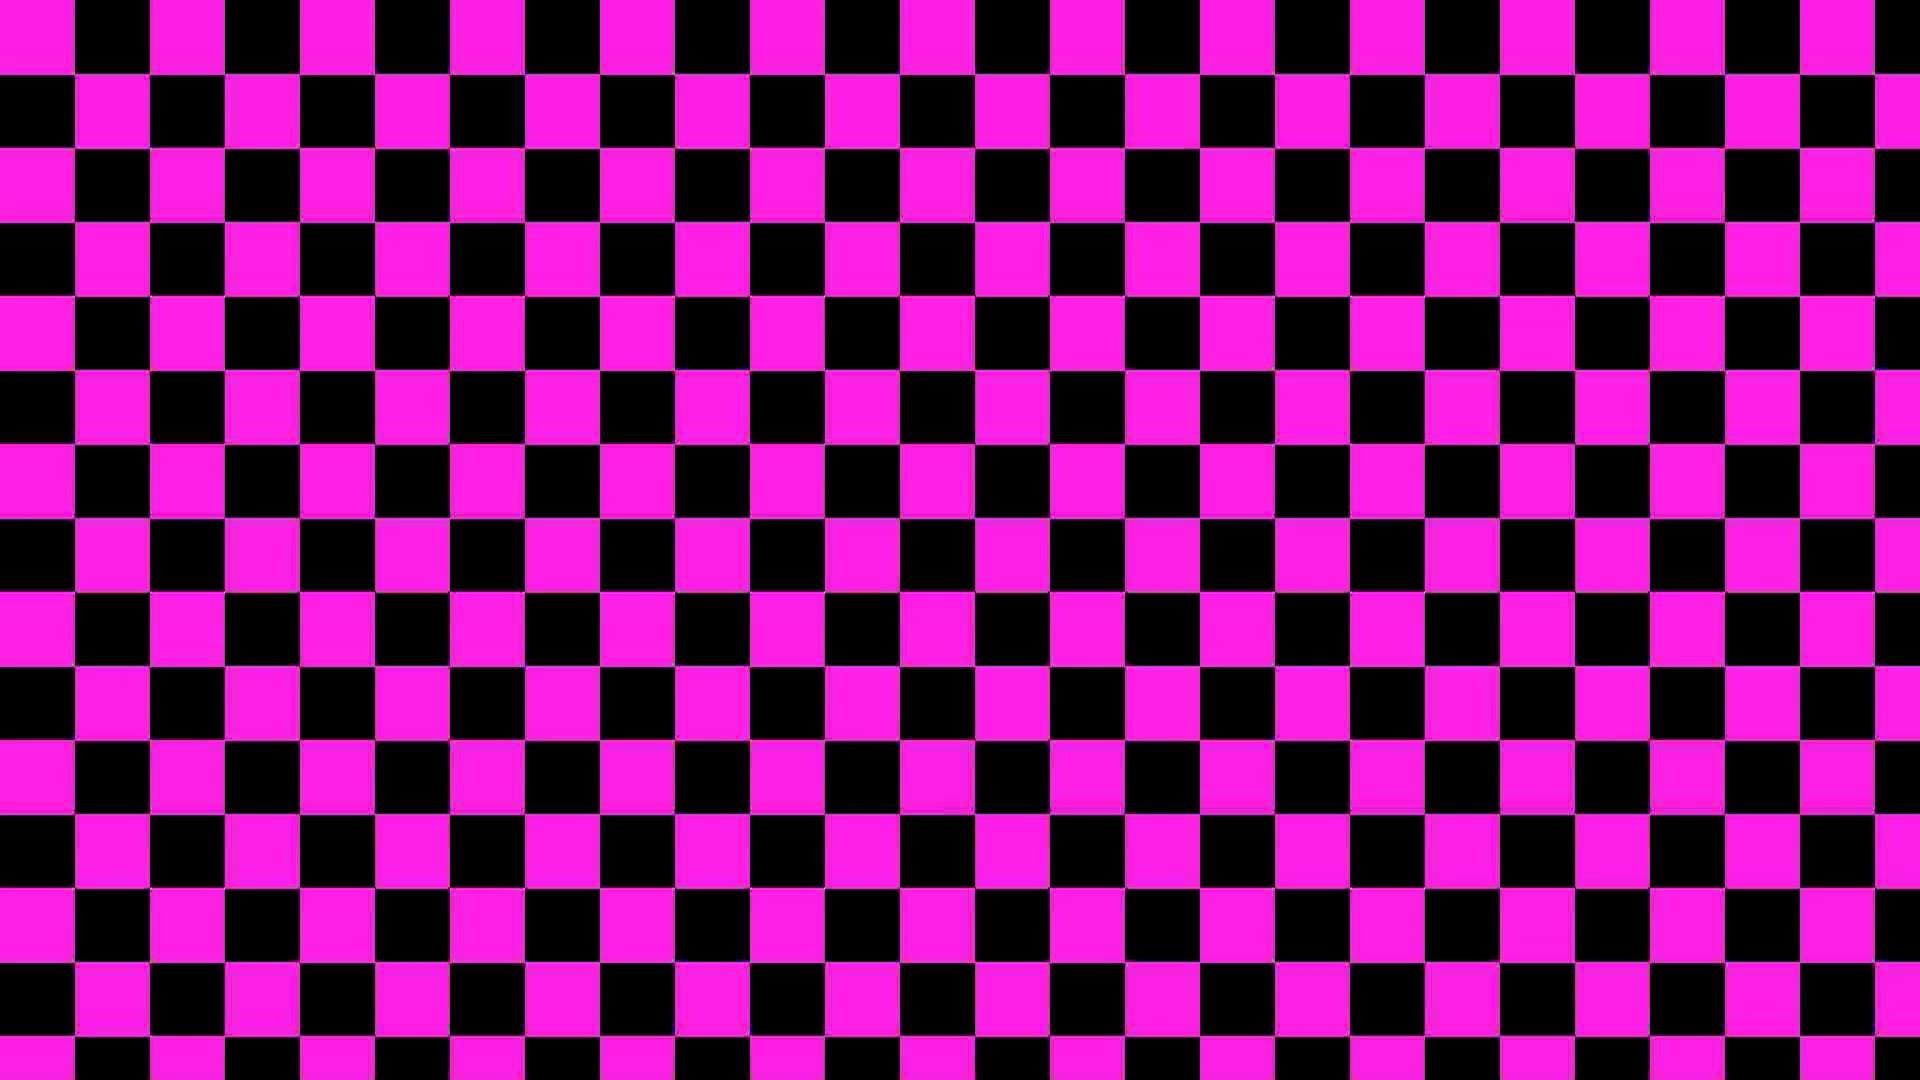 Res: 1920x1080, Black And Pink Wallpaper Borders 21 Widescreen Wallpaper